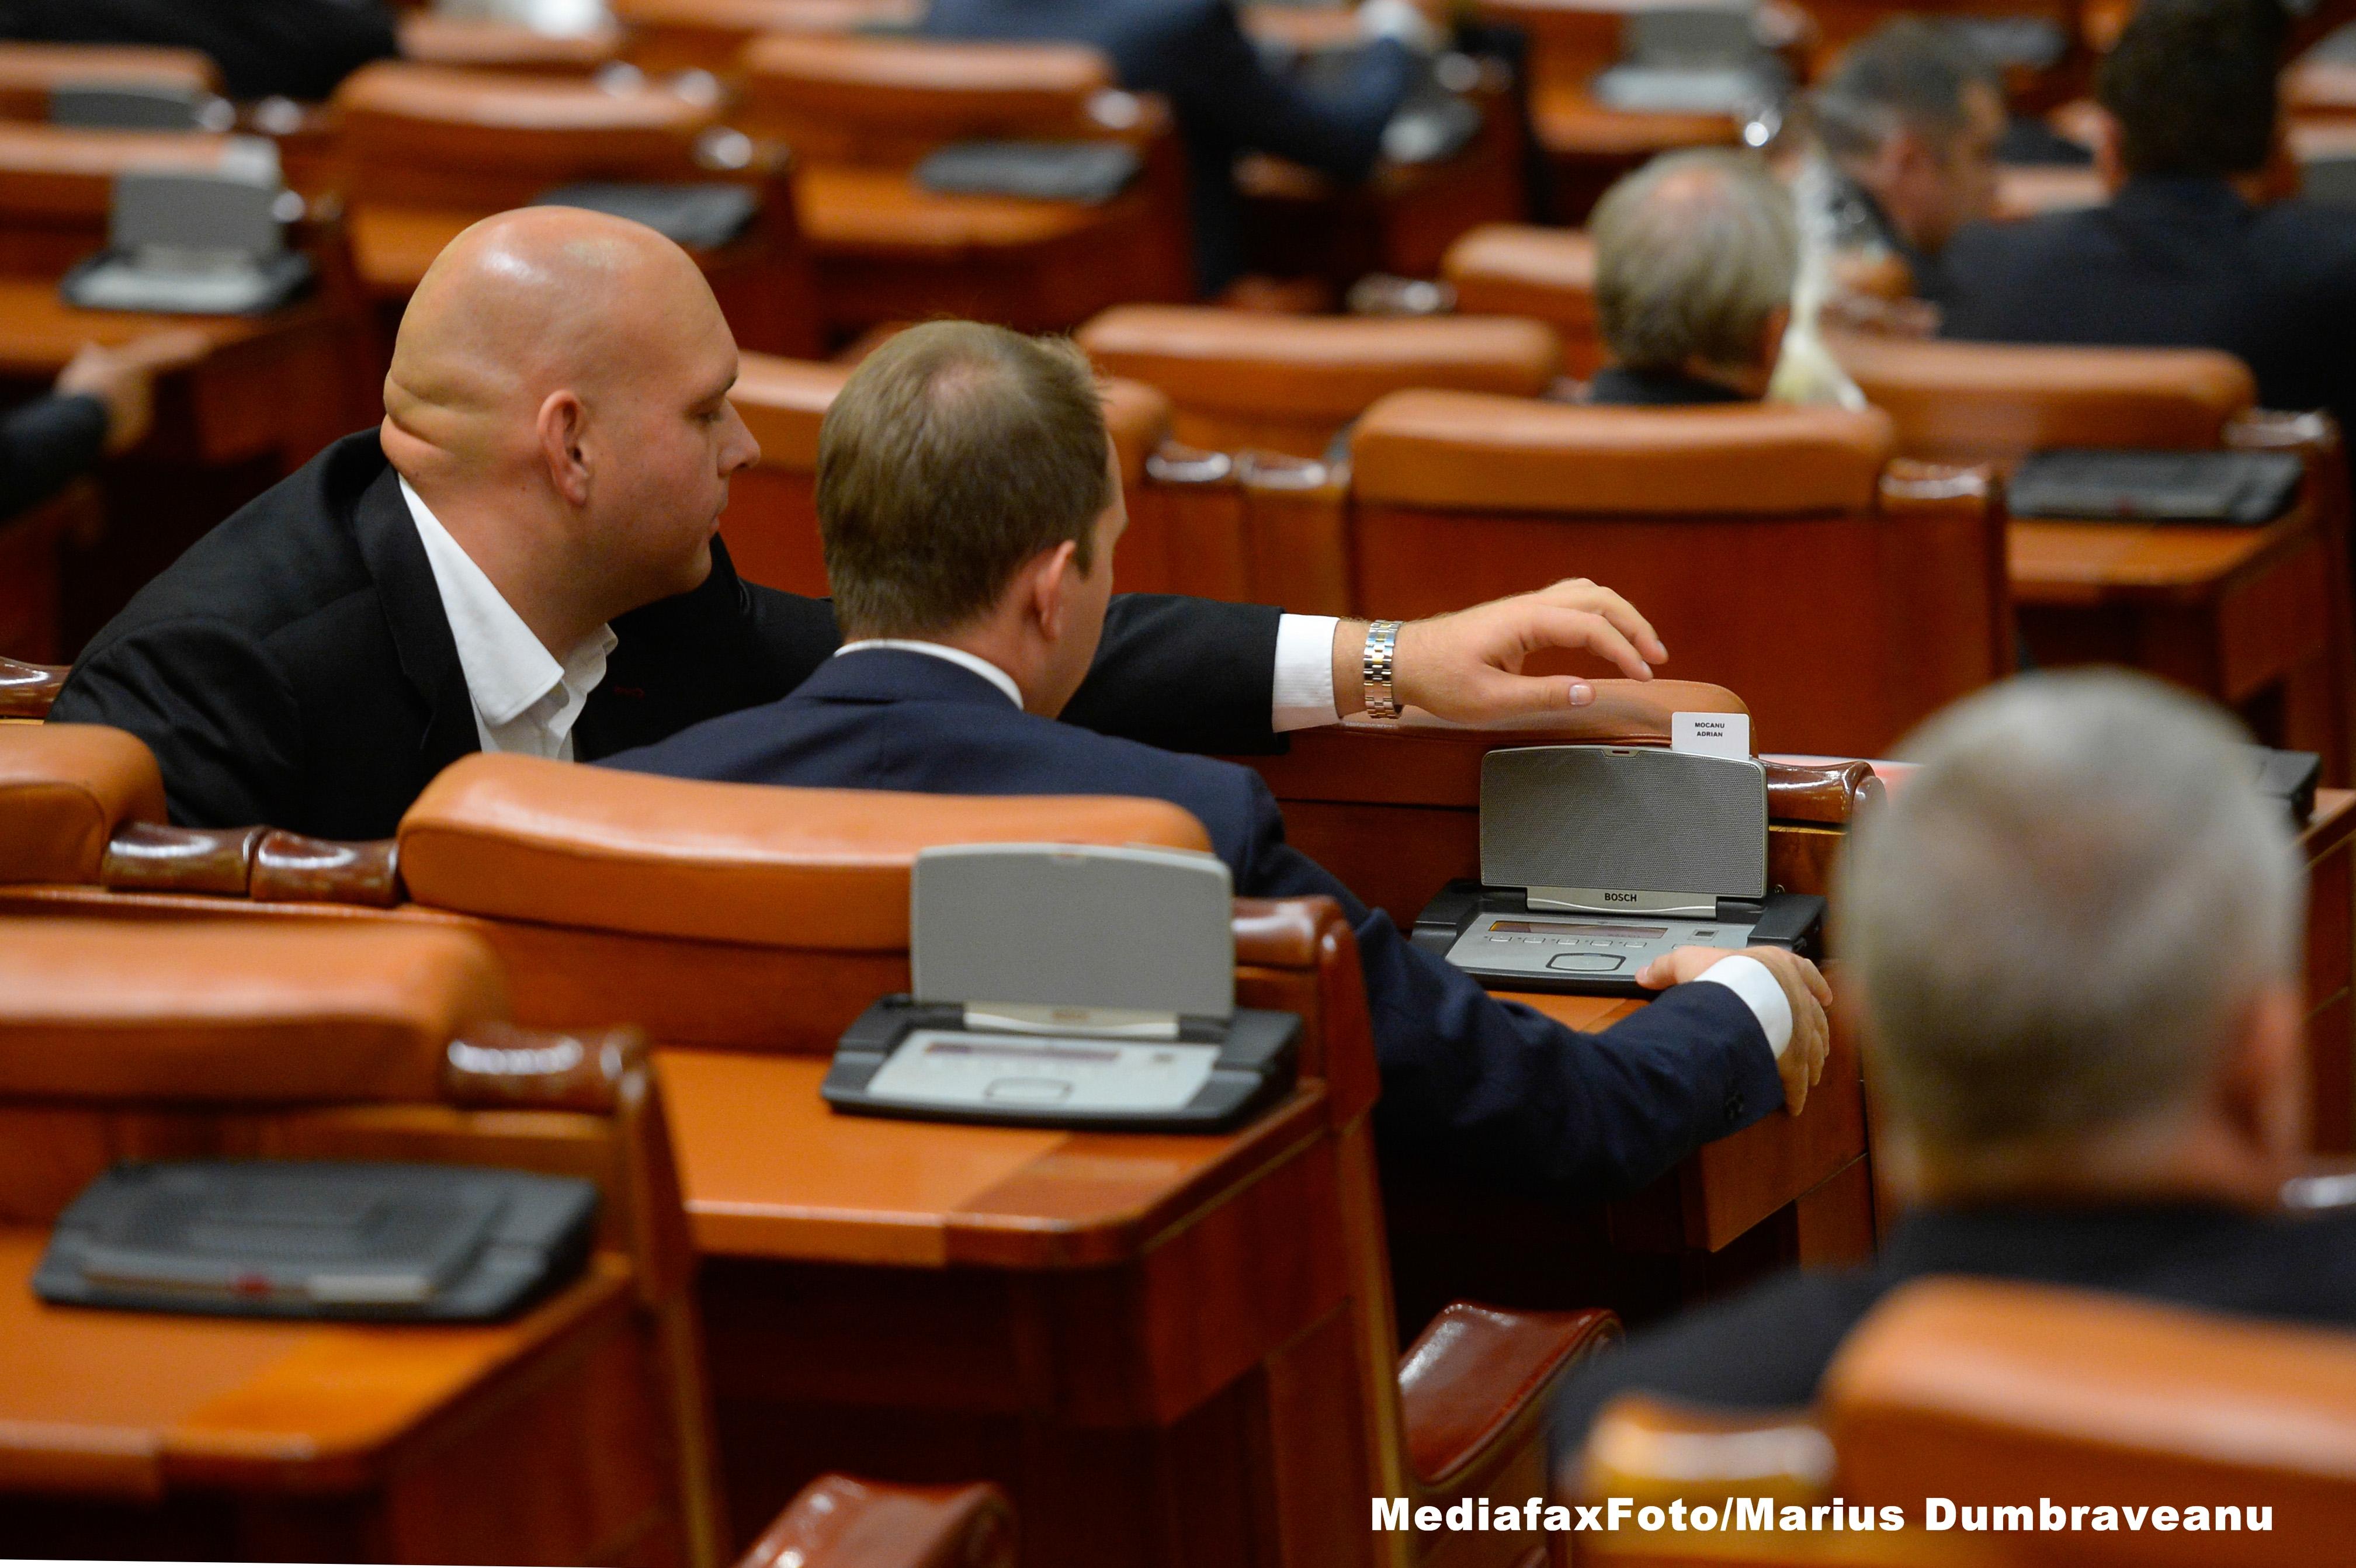 32 de parlamentari, acuzati de ANI de incompatibilitate sau fals in declaratii. Petre Roman anunta ca va depune o contestatie